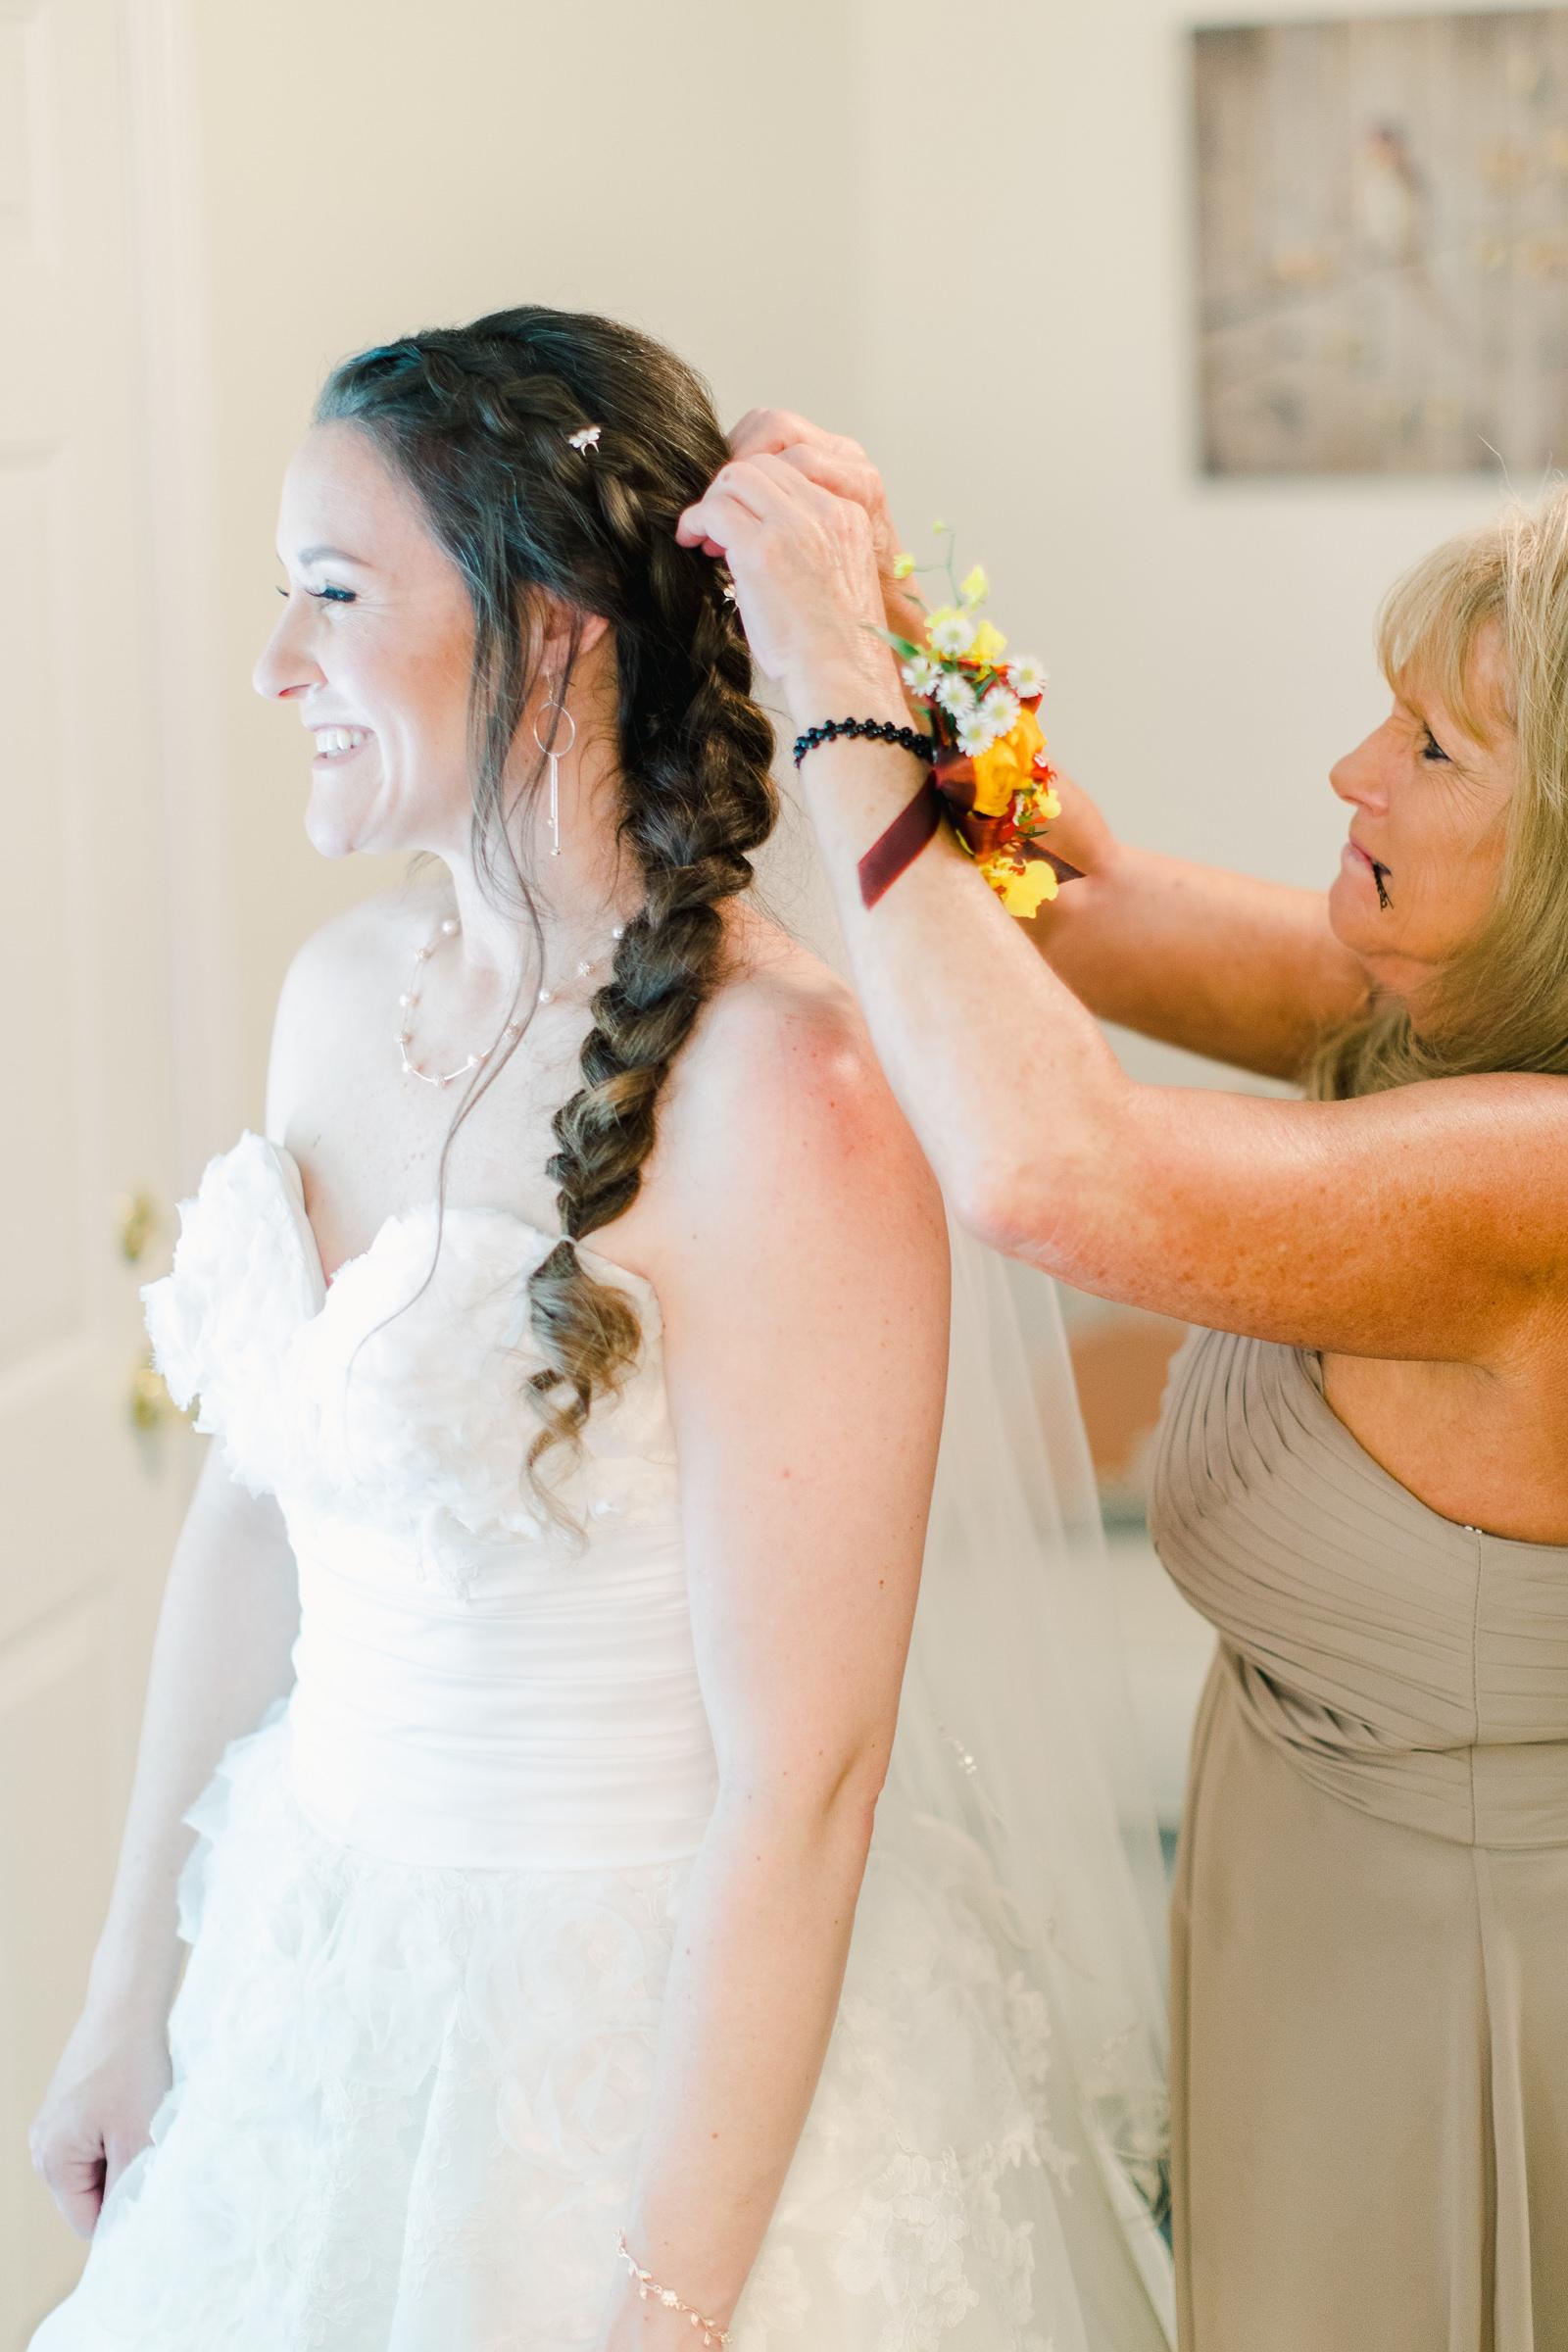 Millcreek Inn Summer Wedding, Utah wedding photography Millcreek Canyon, Salt Lake City, bride getting ready long veil